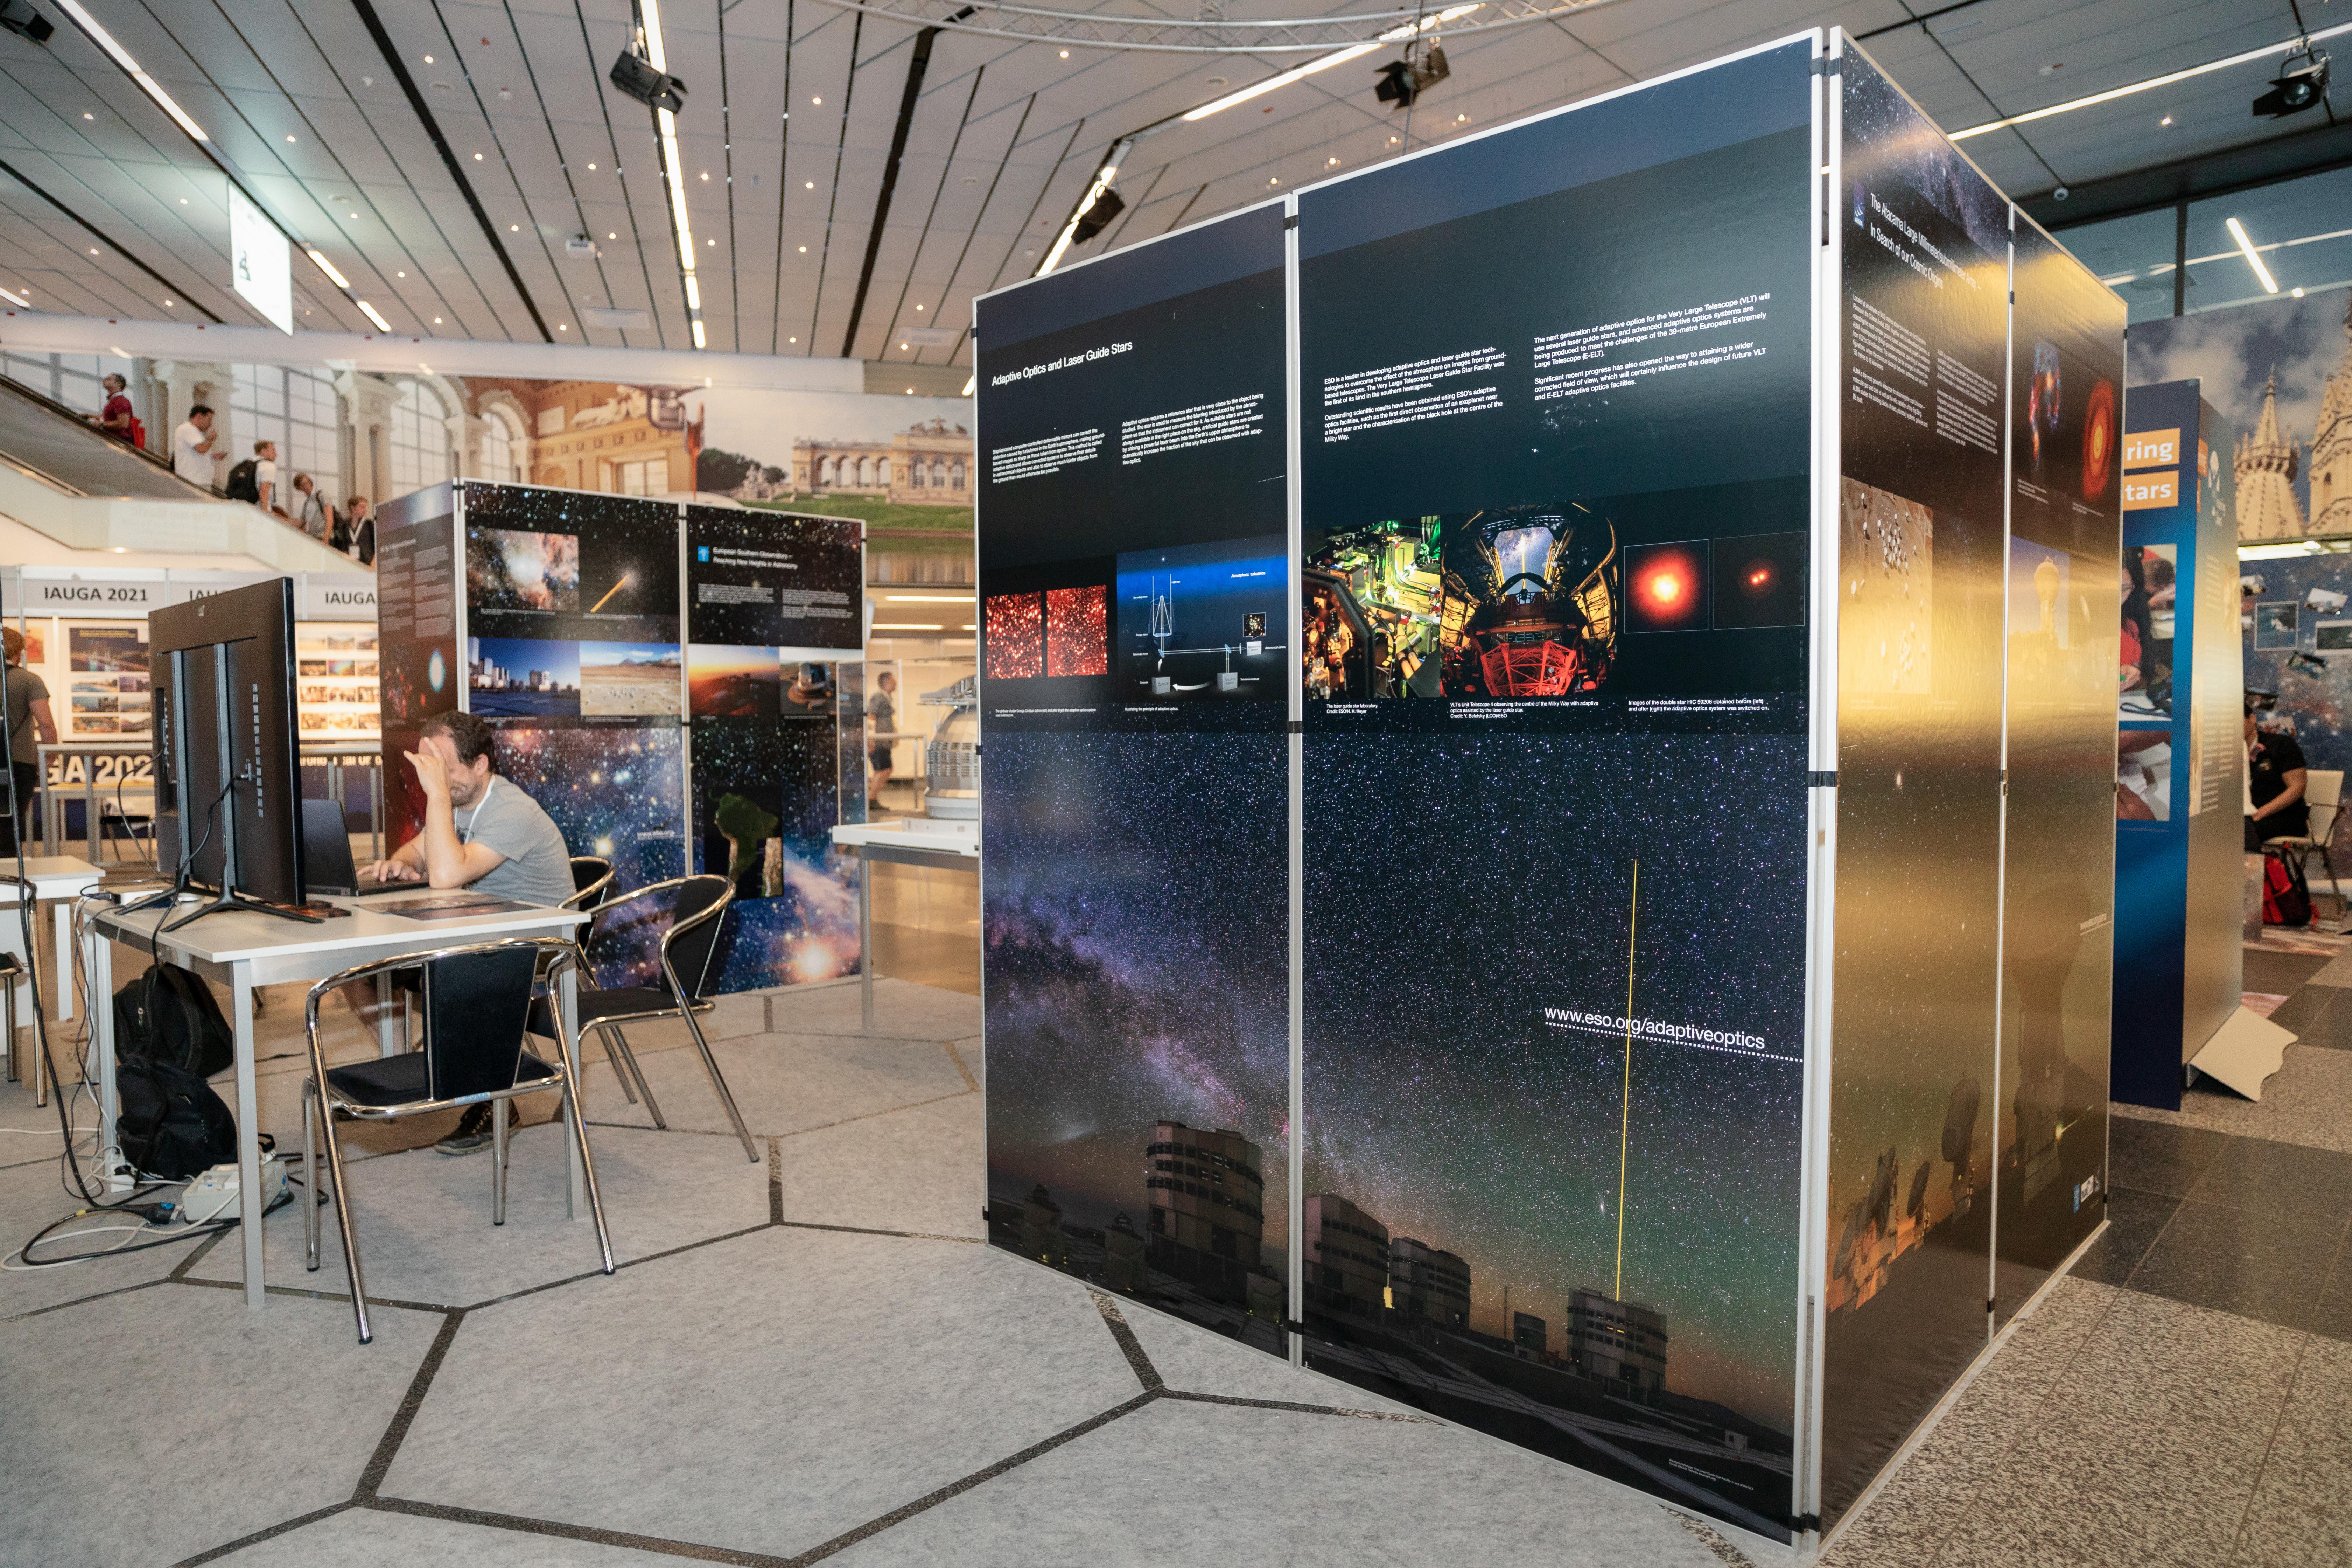 ESO stand at the IAU GA 2018